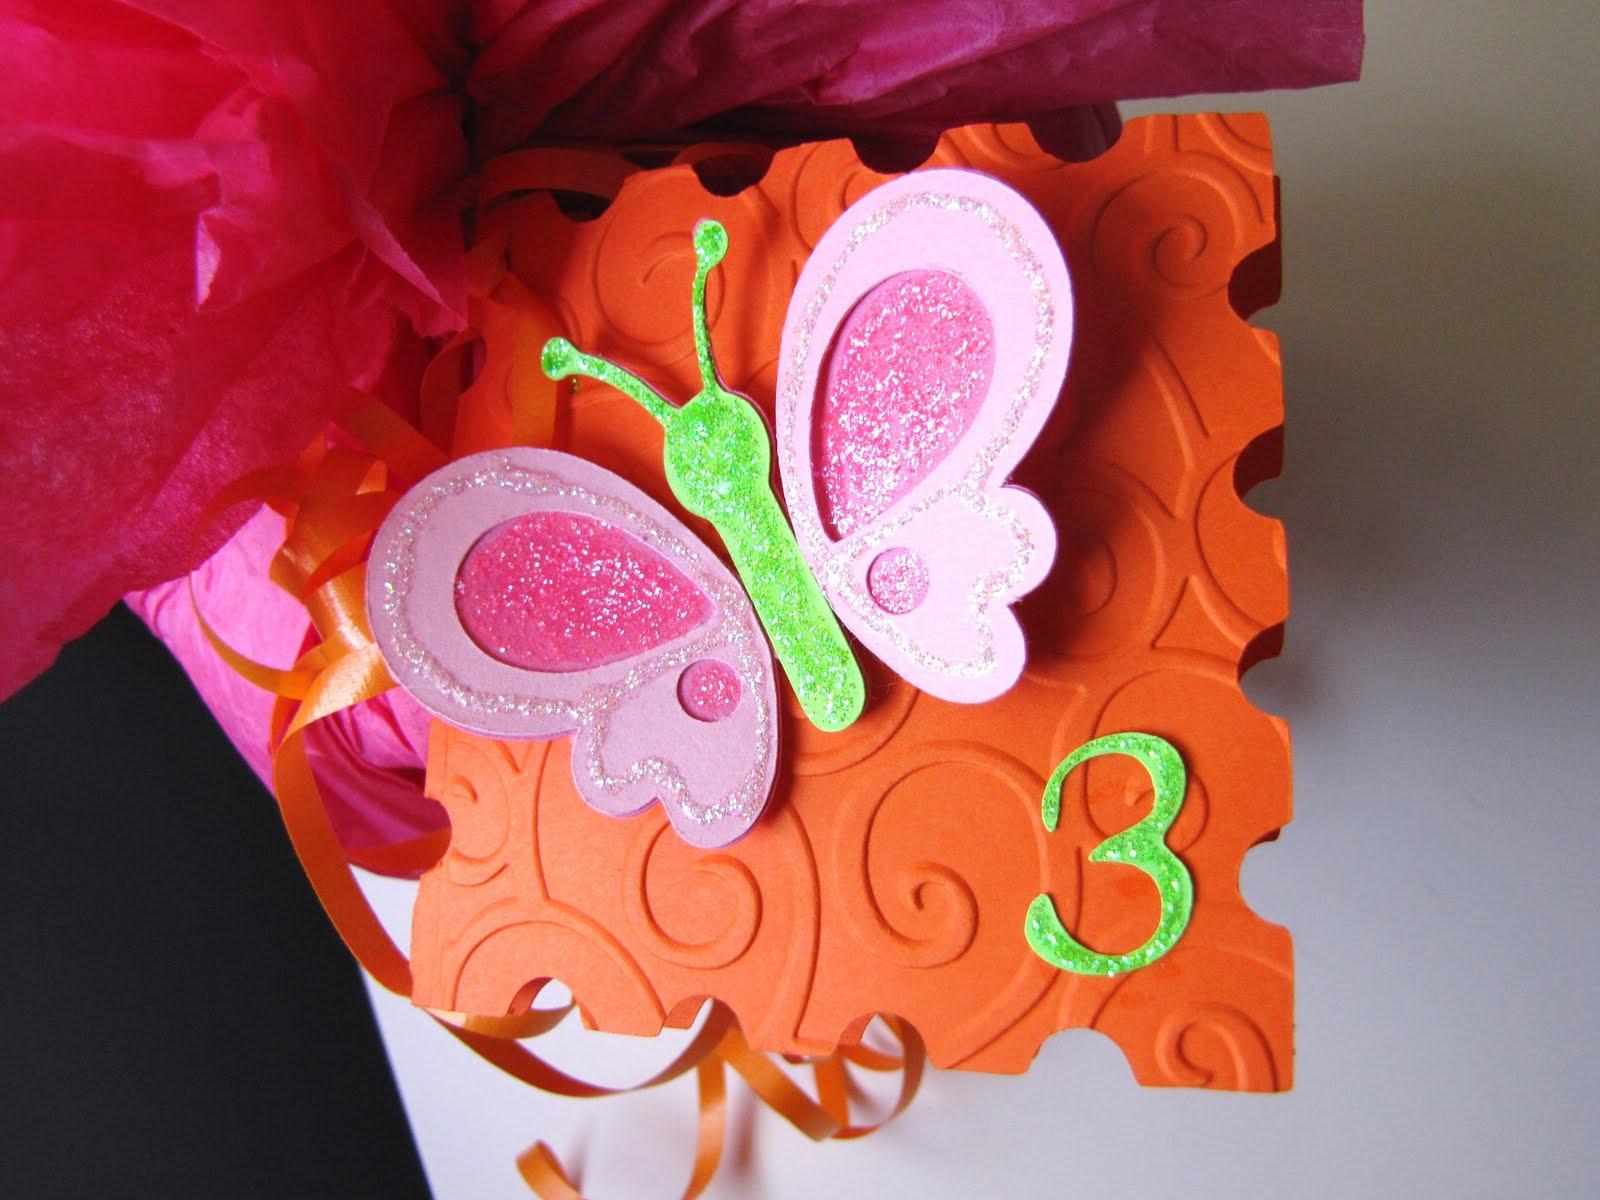 http://3.bp.blogspot.com/-dF8FtxmQNu4/TaZDznWaIgI/AAAAAAAAAN0/Jqo2yJtfhFk/s1600/Jessica+3rd+Birthday+Card+2011+%25284%2529.JPG